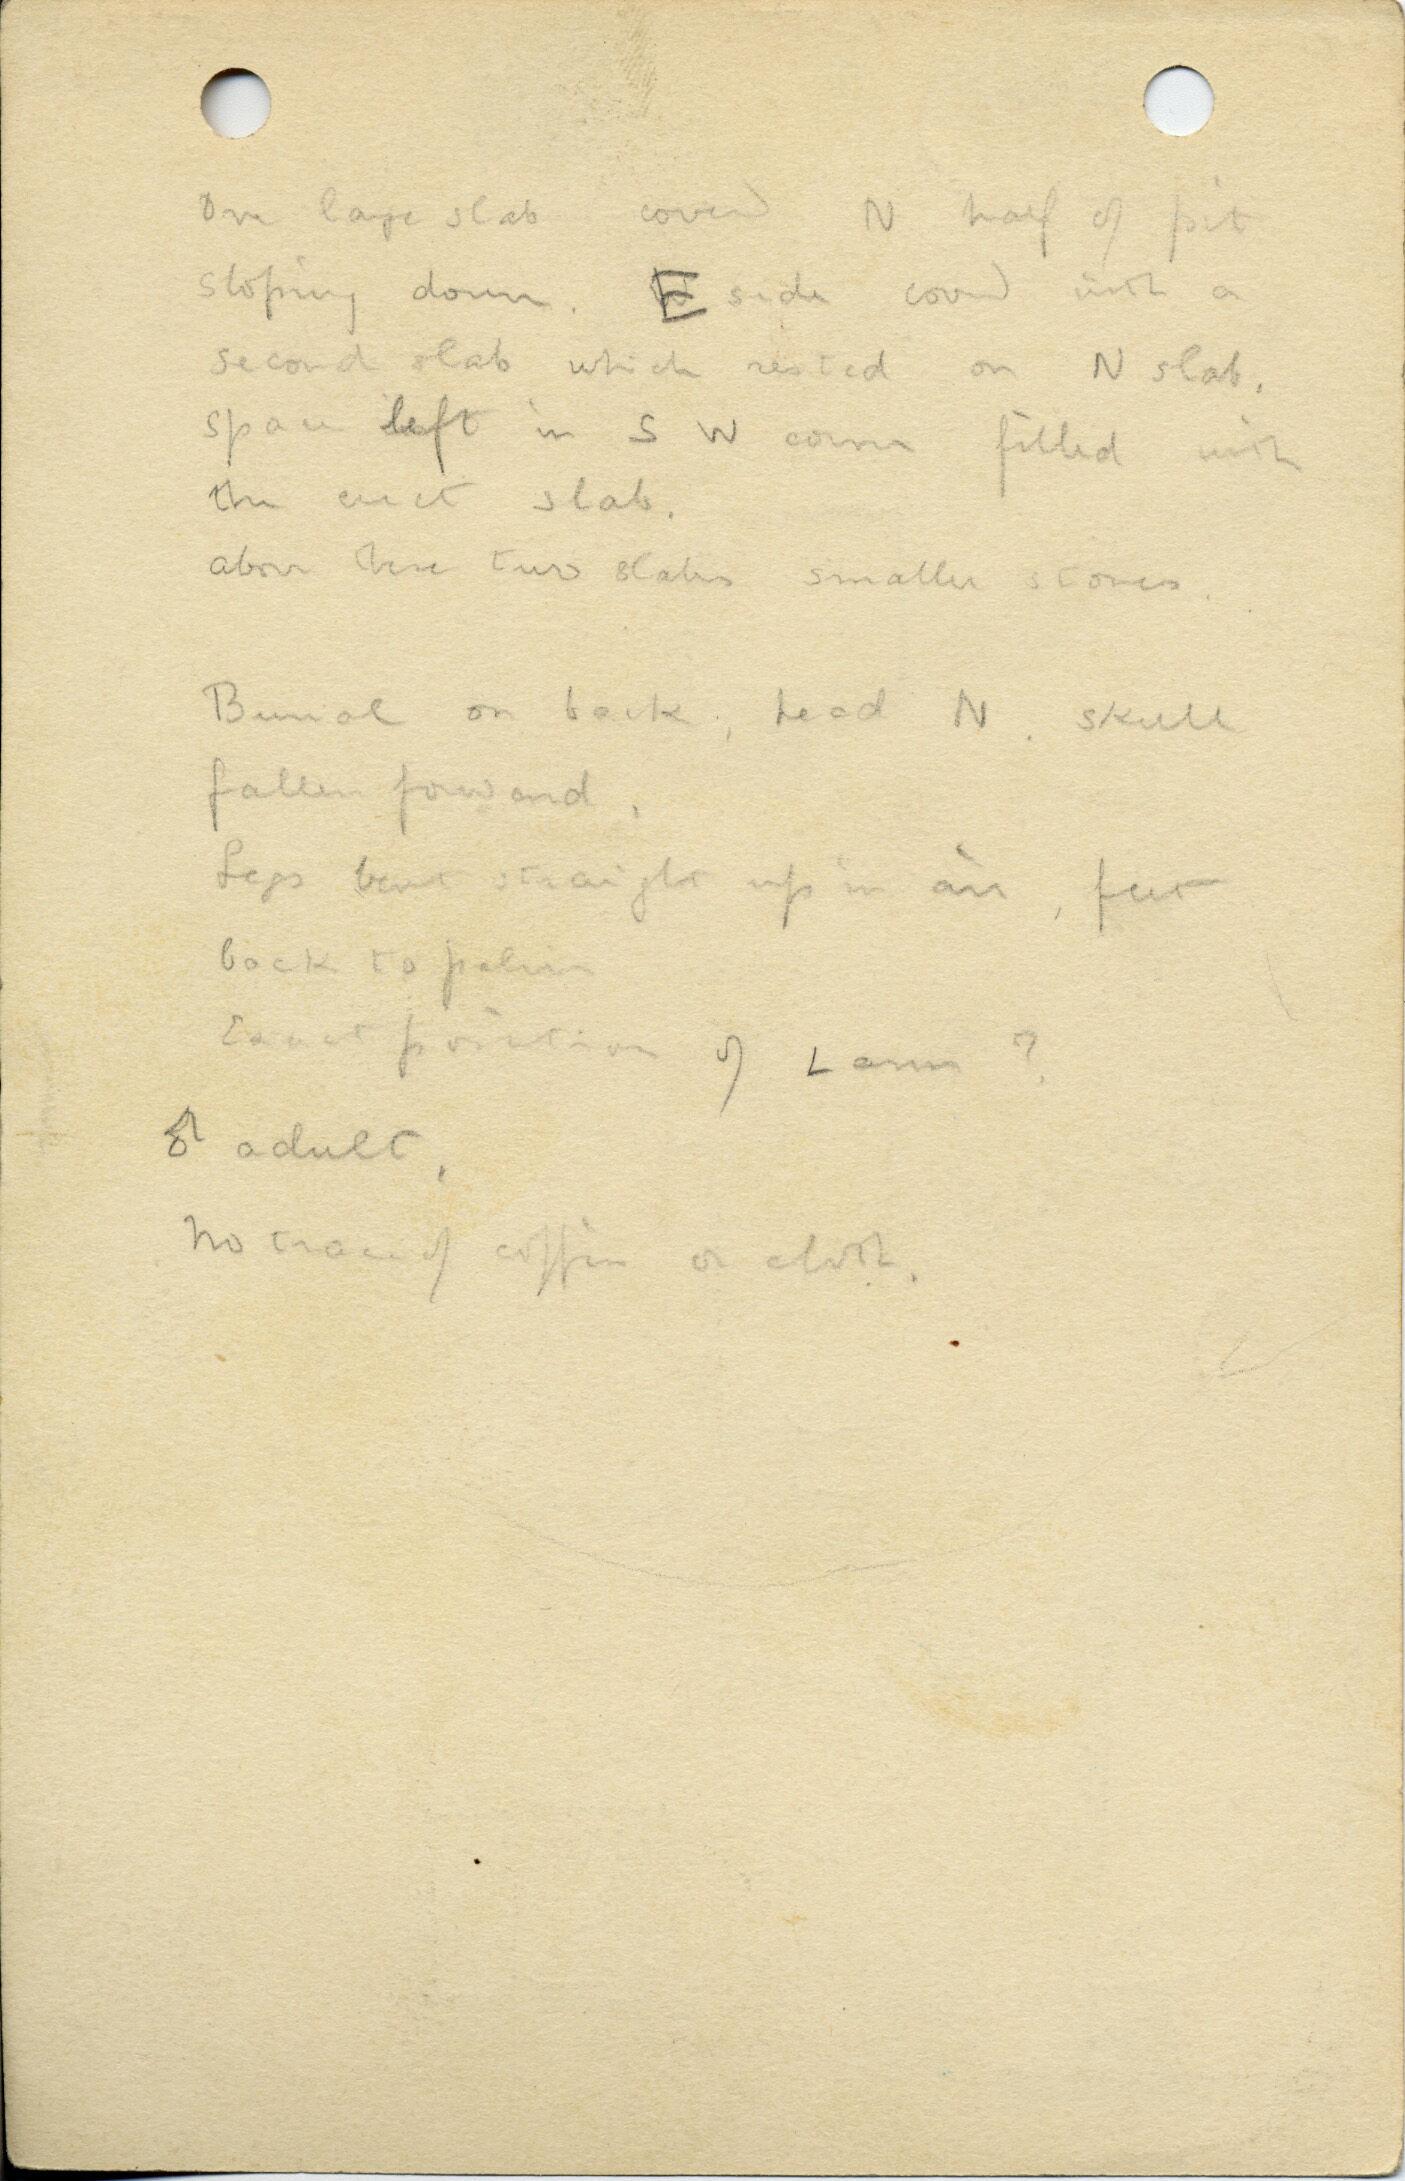 Notes: G 1038, Shaft D, notes